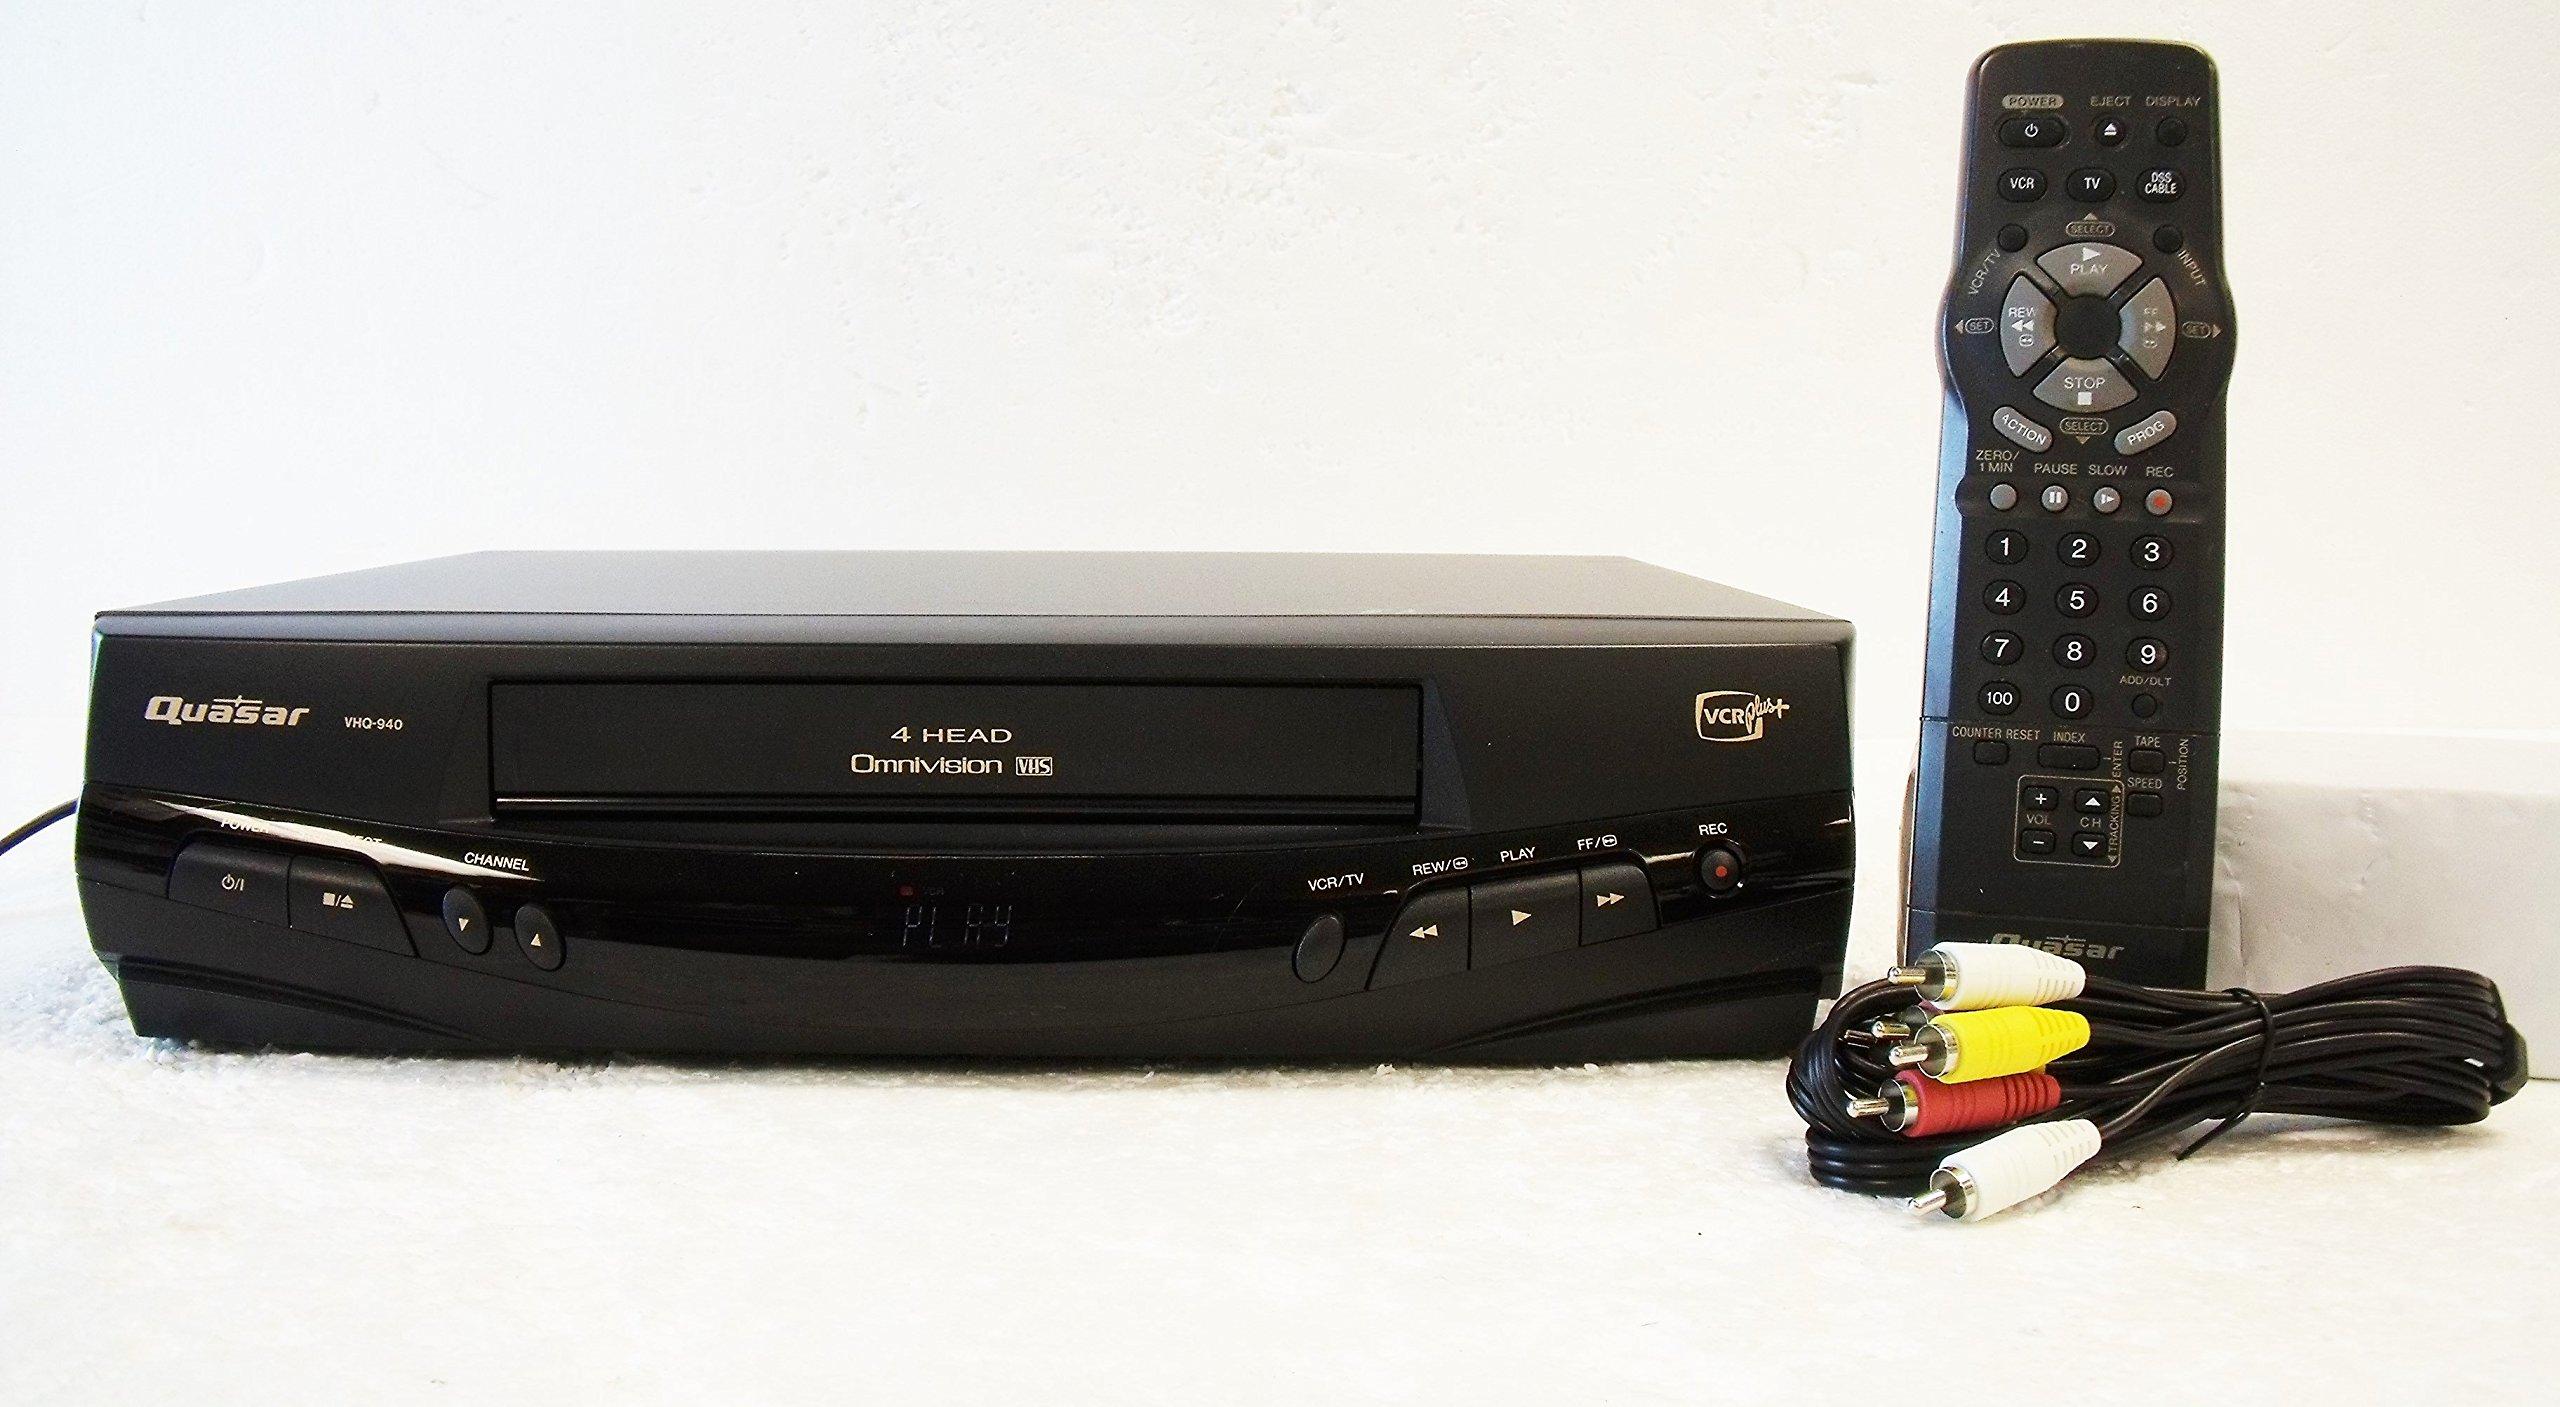 Quasar VHQ-940 Video Cassette Recorder Player VCR 4 Head Omnivision VHS